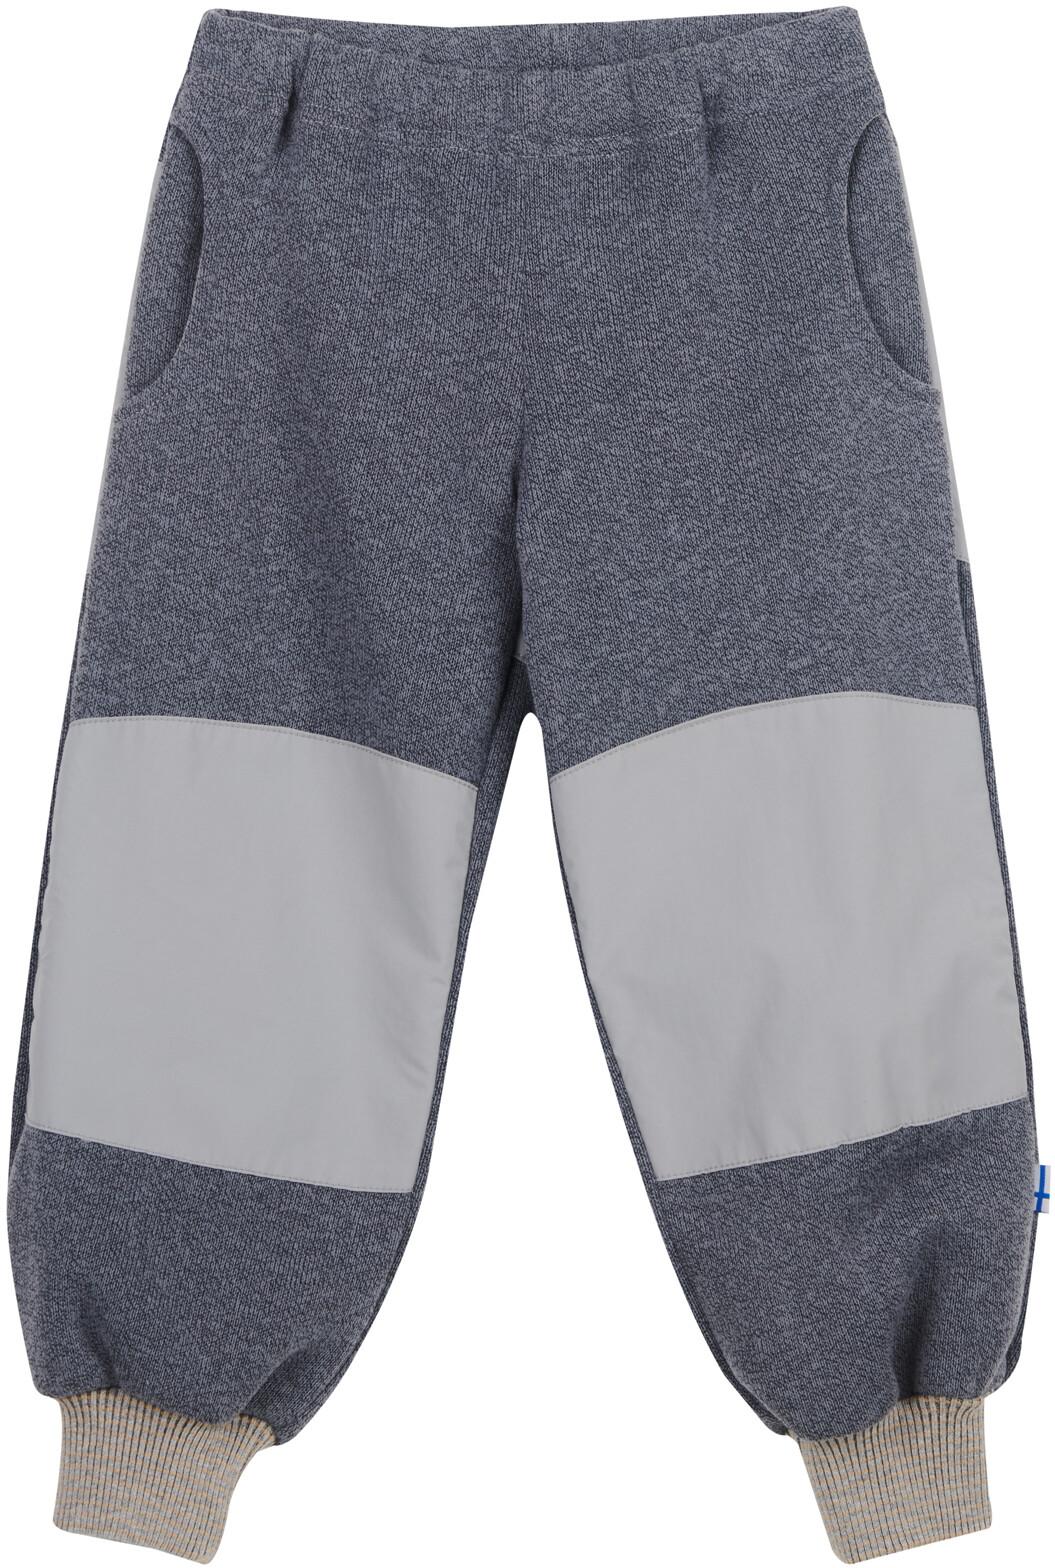 Herre One color French Sweat Shorts Snow Melange fra Les